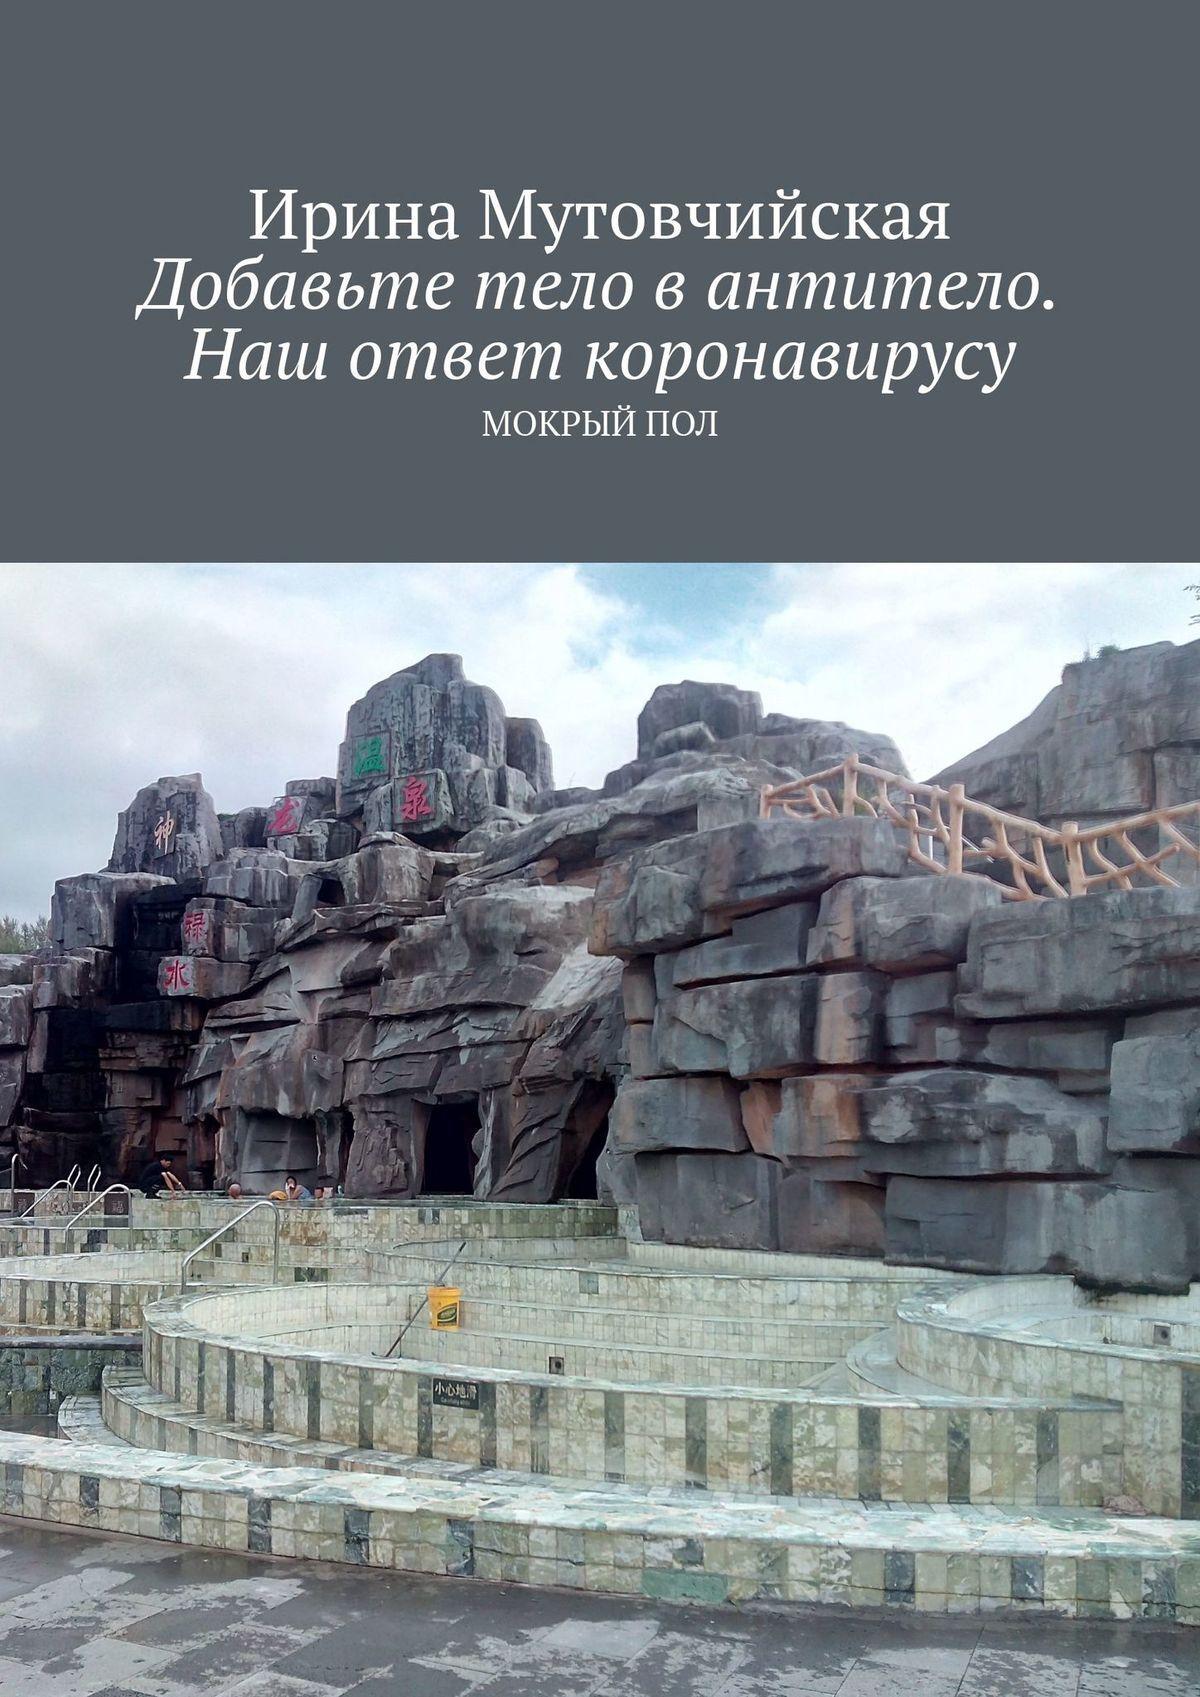 Мокрыйпол